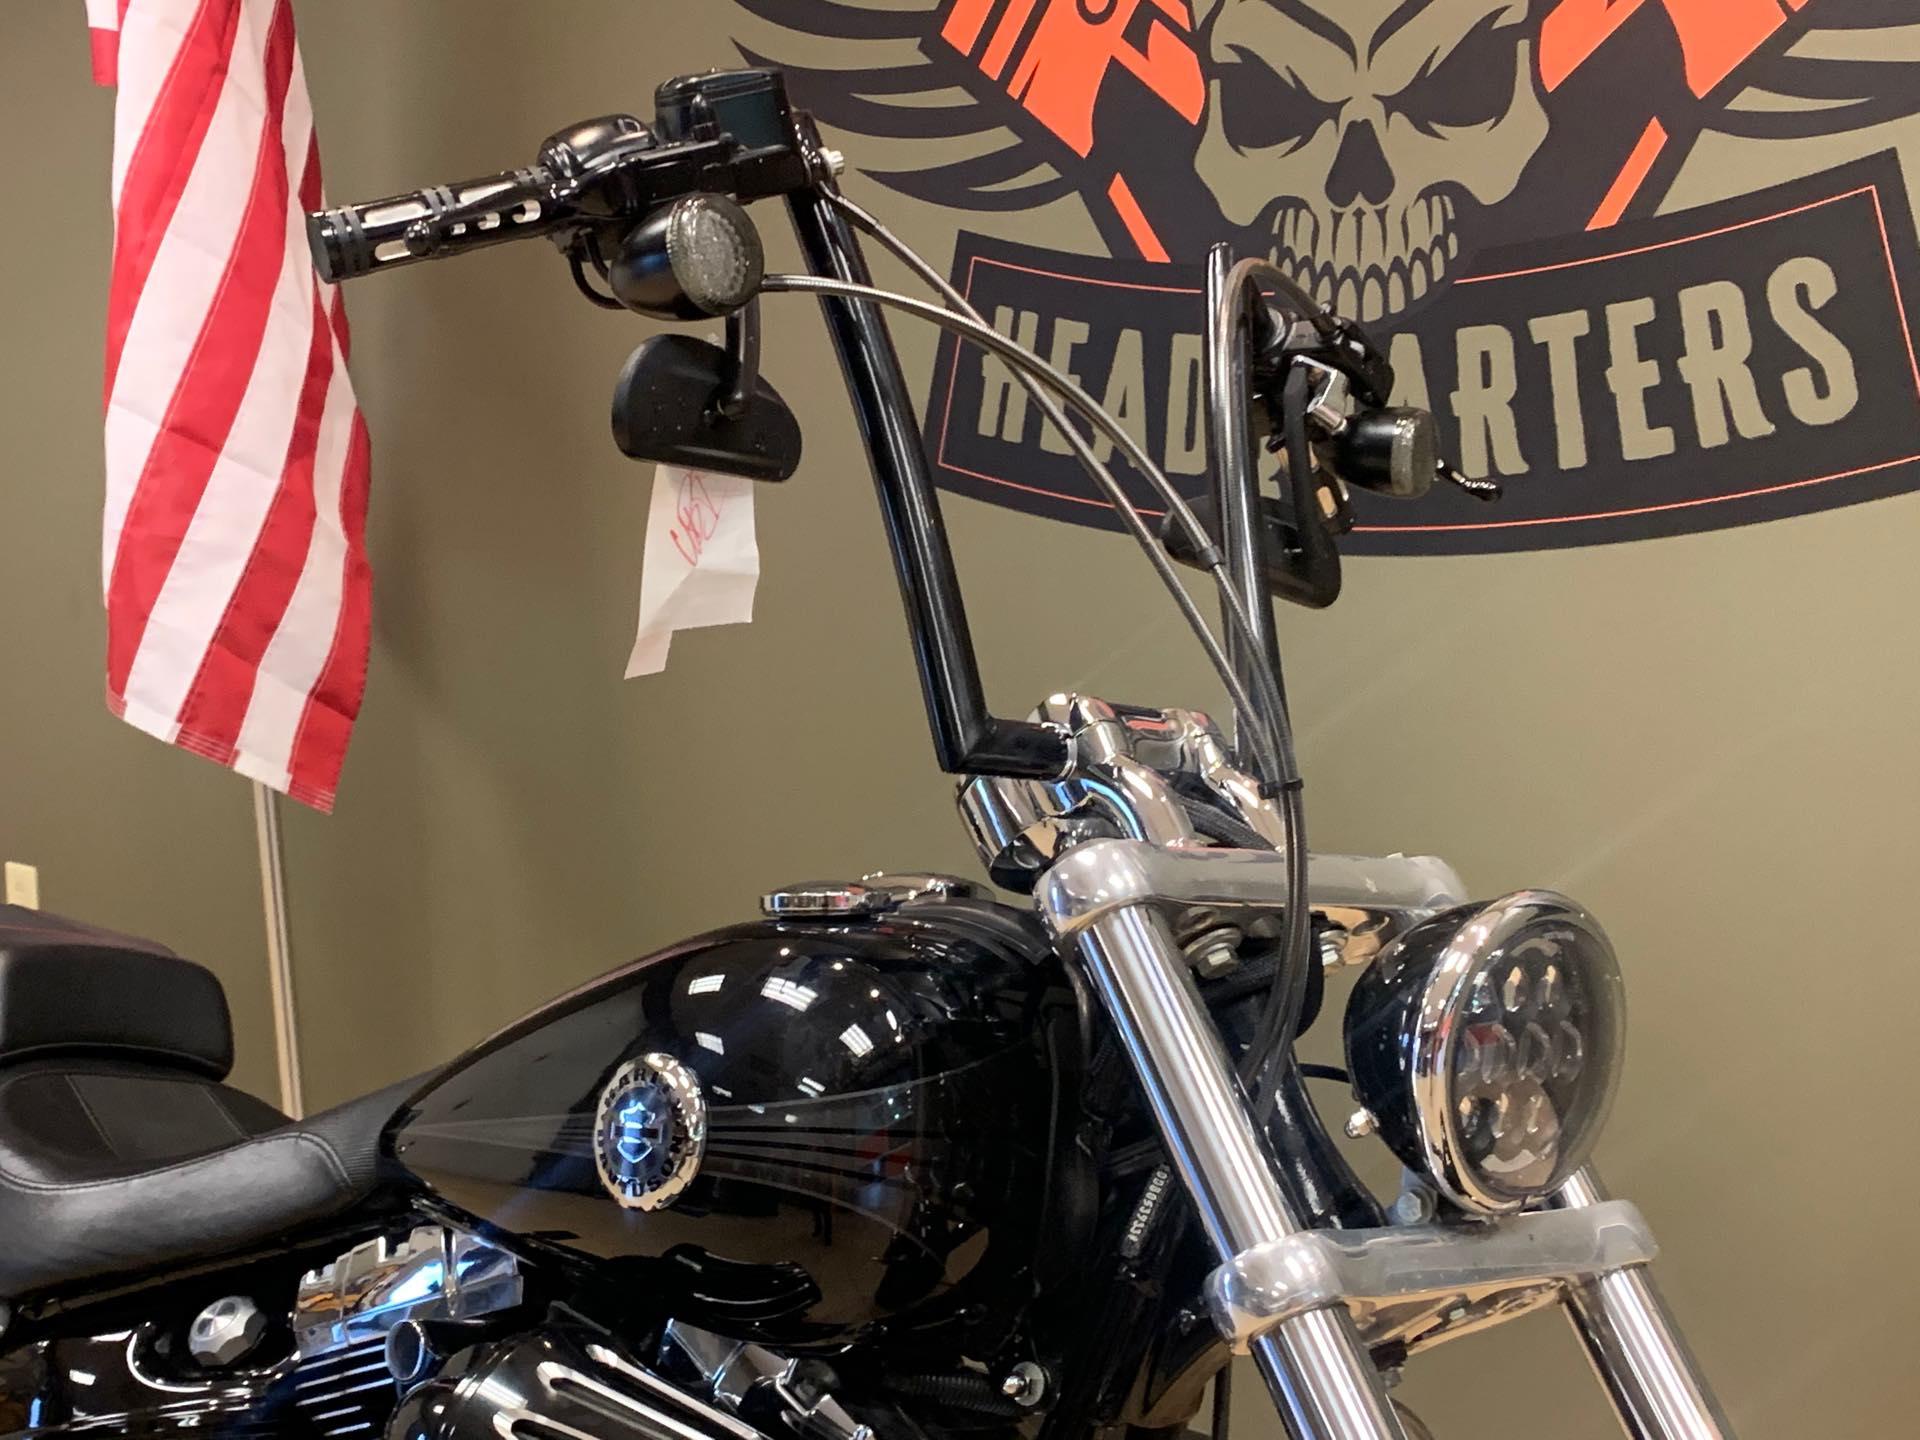 2013 Harley-Davidson Softail Breakout at Loess Hills Harley-Davidson